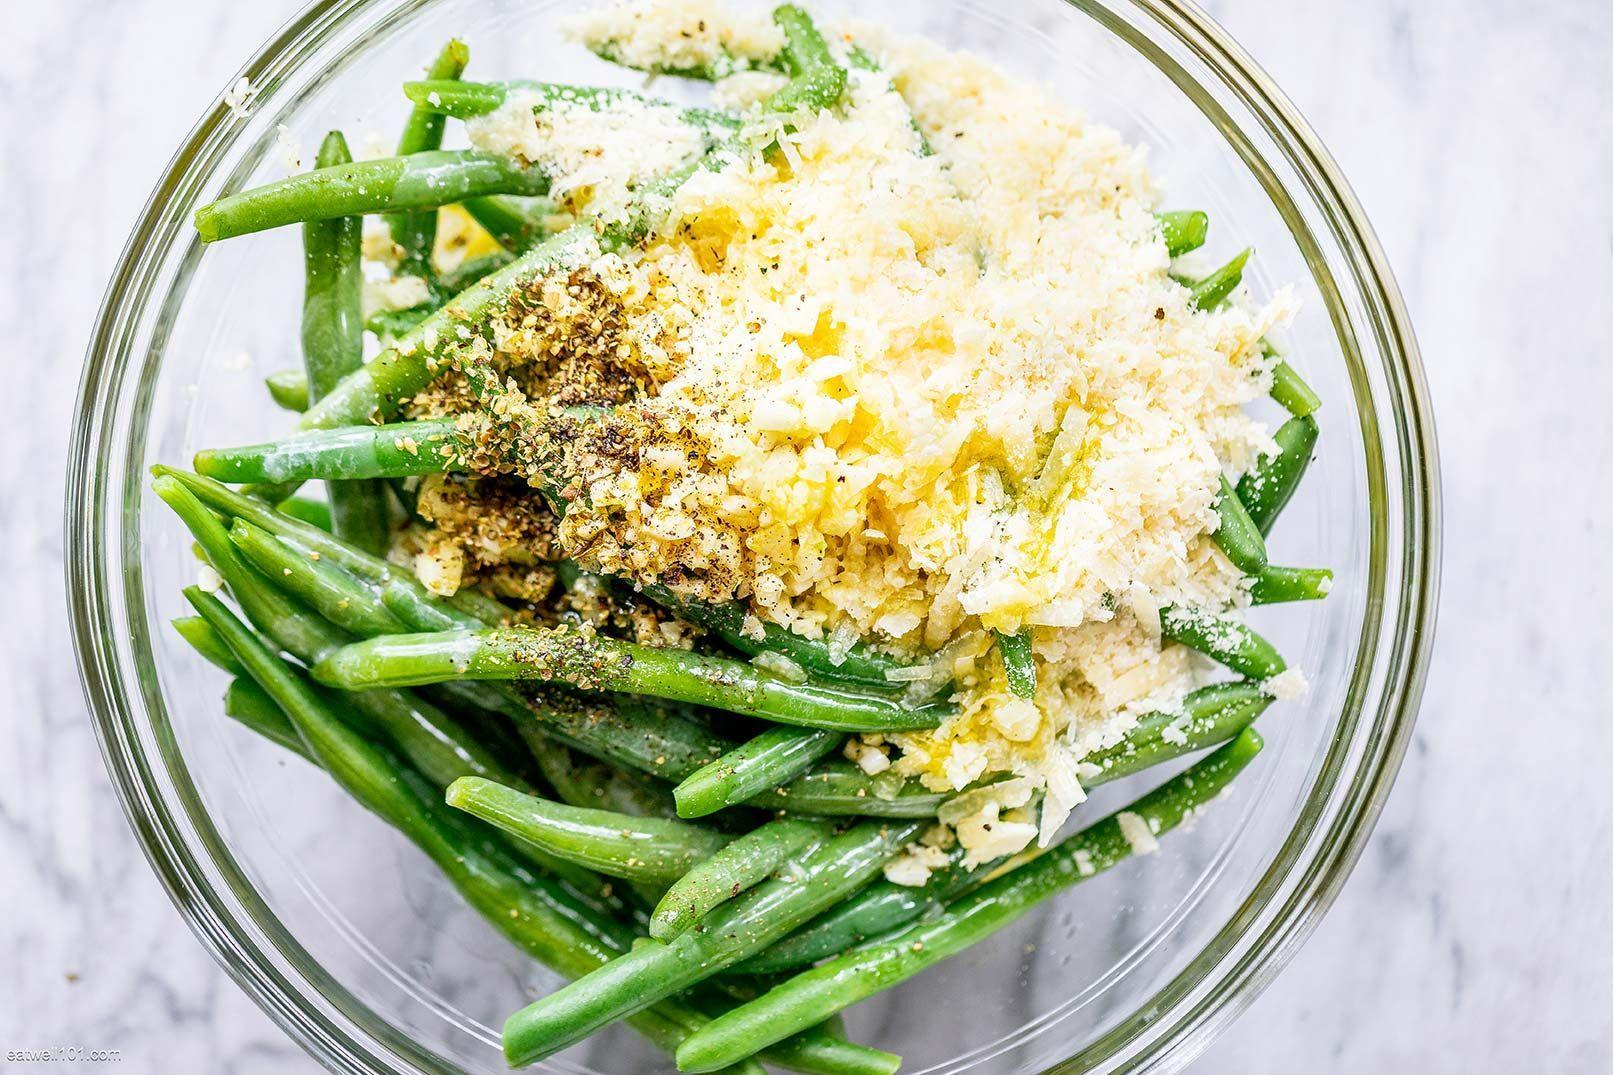 Roasted Garlic Parmesan Green Beans -  Roasted Garlic Parmesan Green Beans – – These epic roast